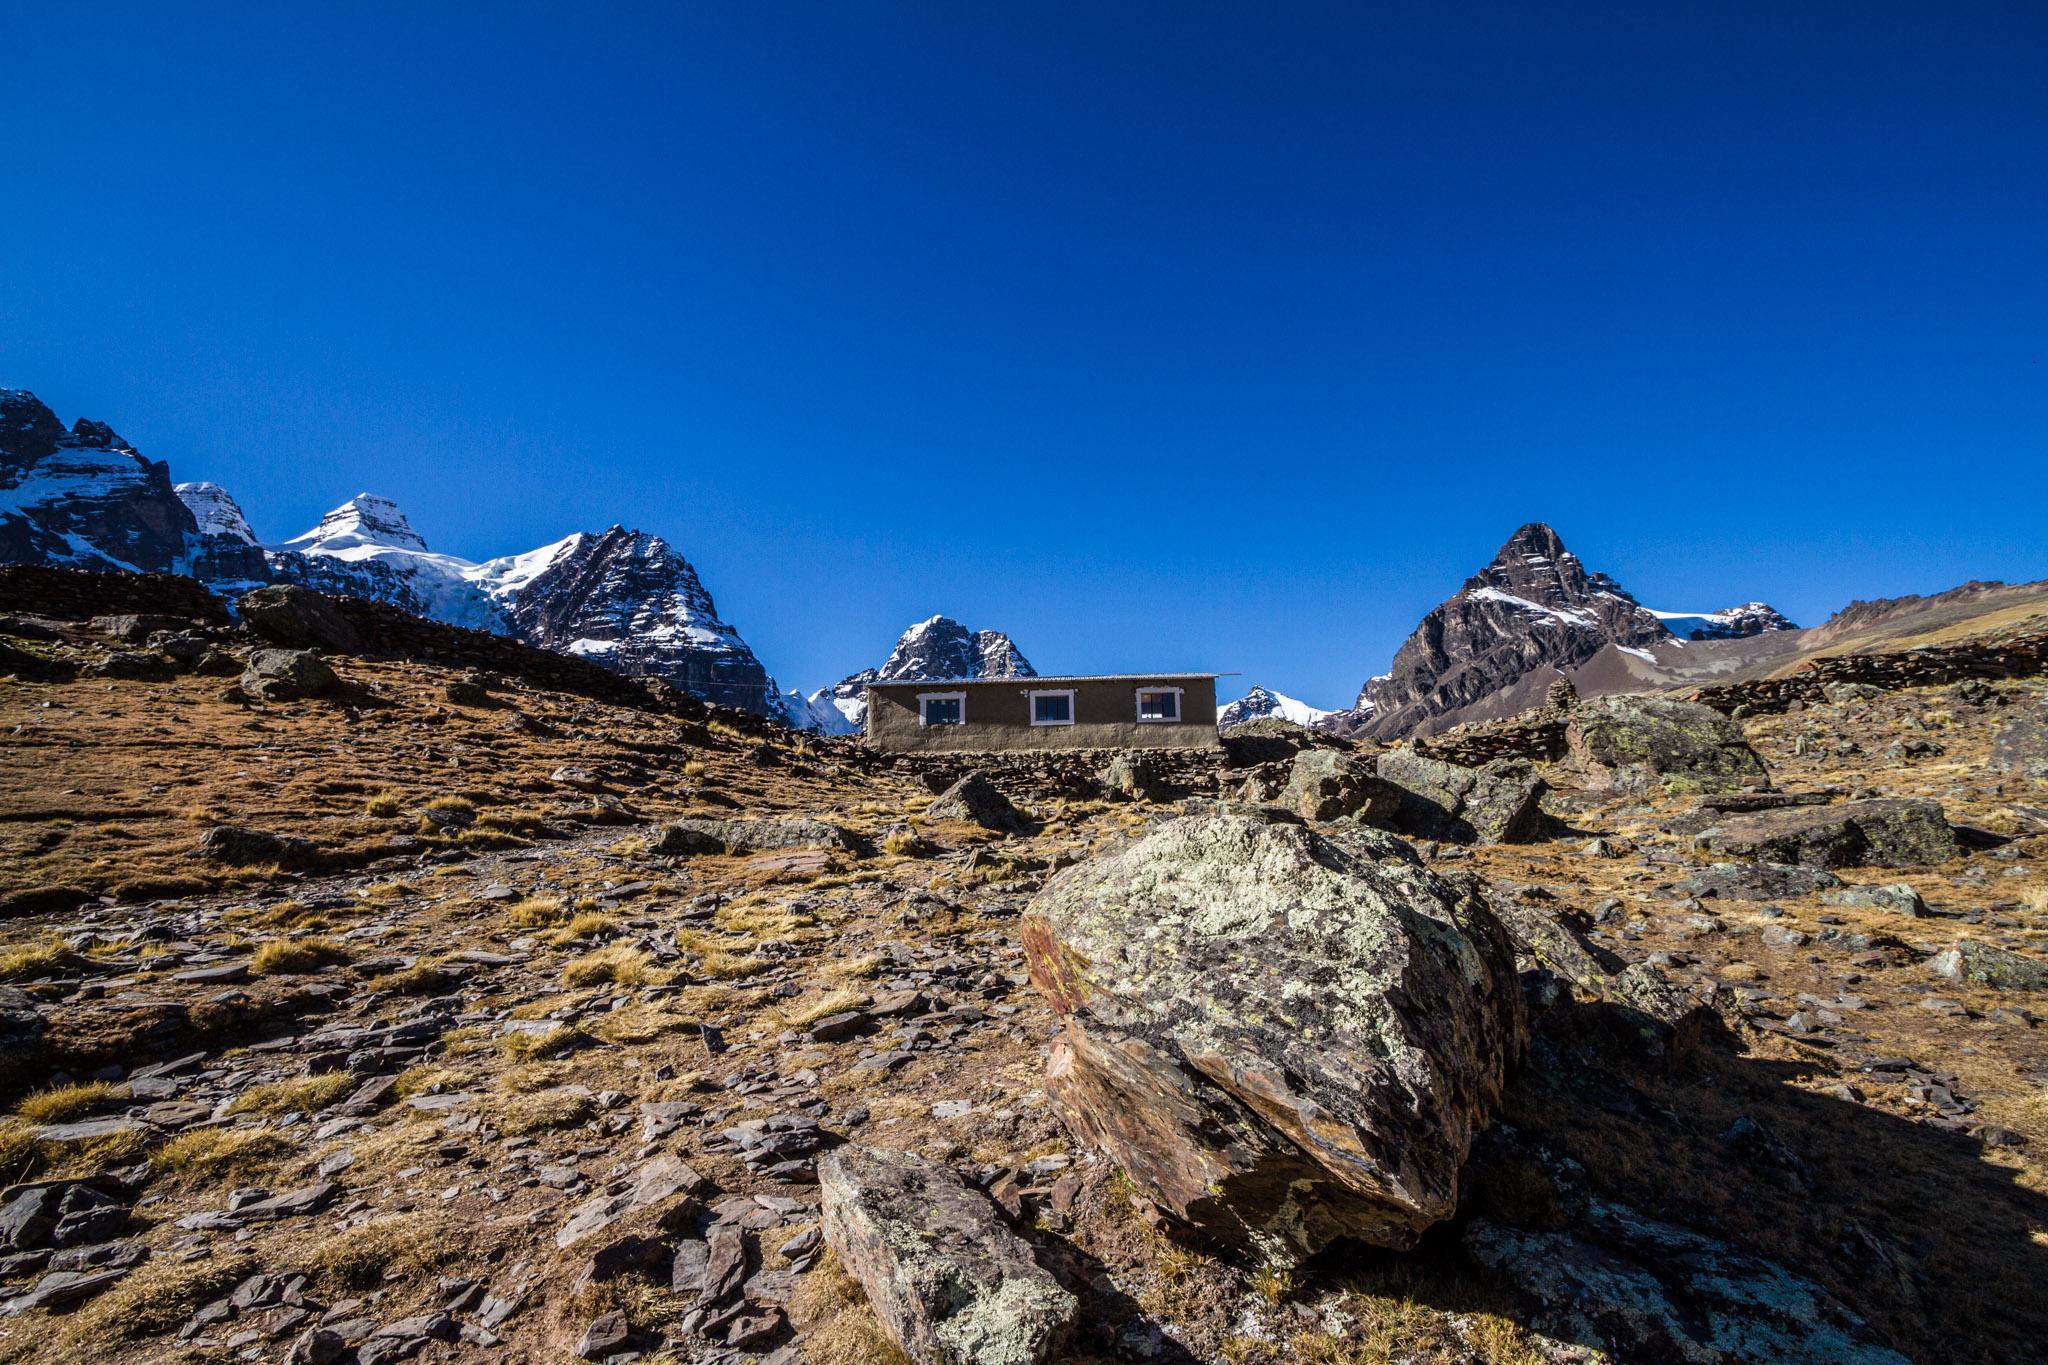 Ali-Barqawi-Studios-Explore-Series-Travel-Adventure-Documentary-C4CGAZA-Bolivia-Mount-Tarija-2015-122.jpg